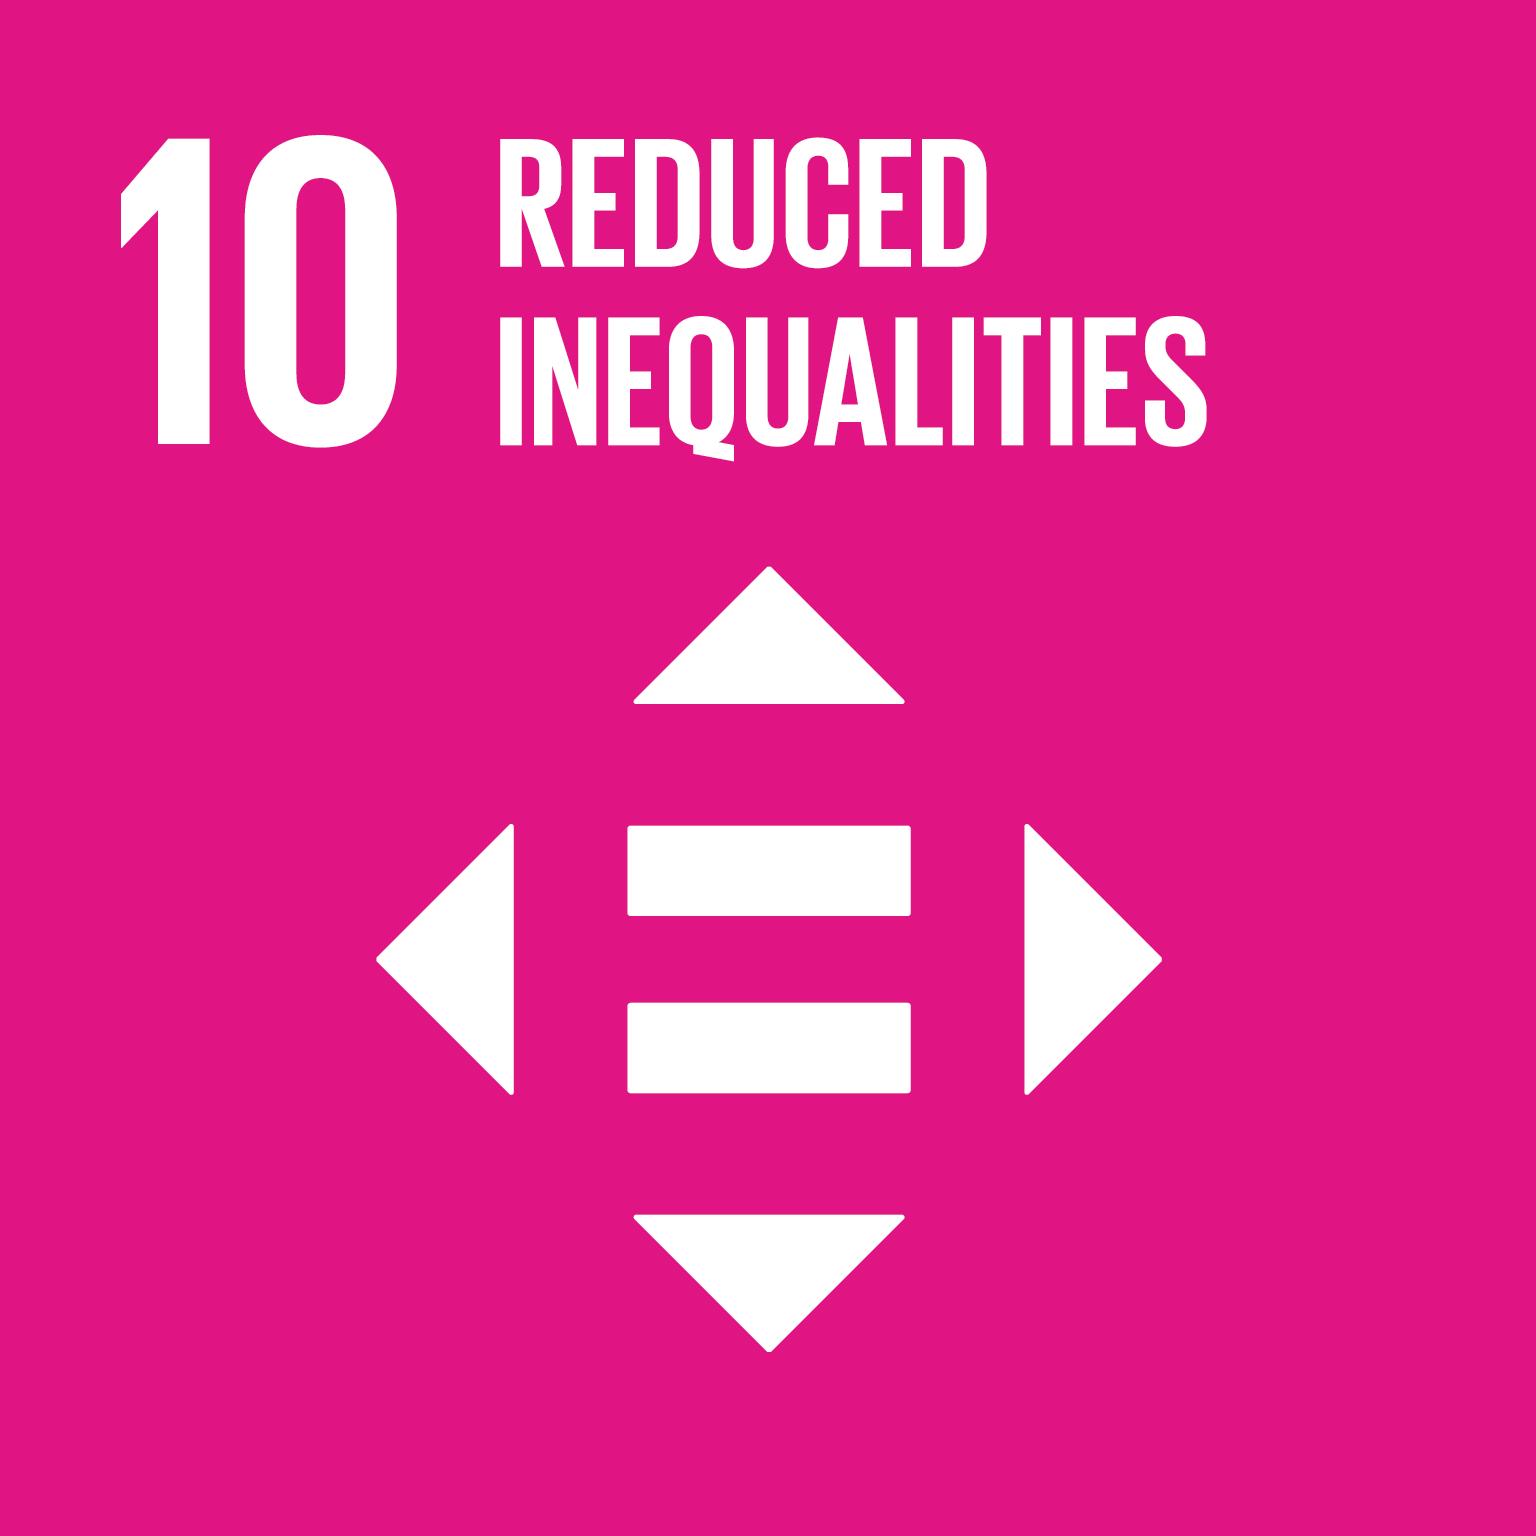 10 Reduced Inequalities SDG